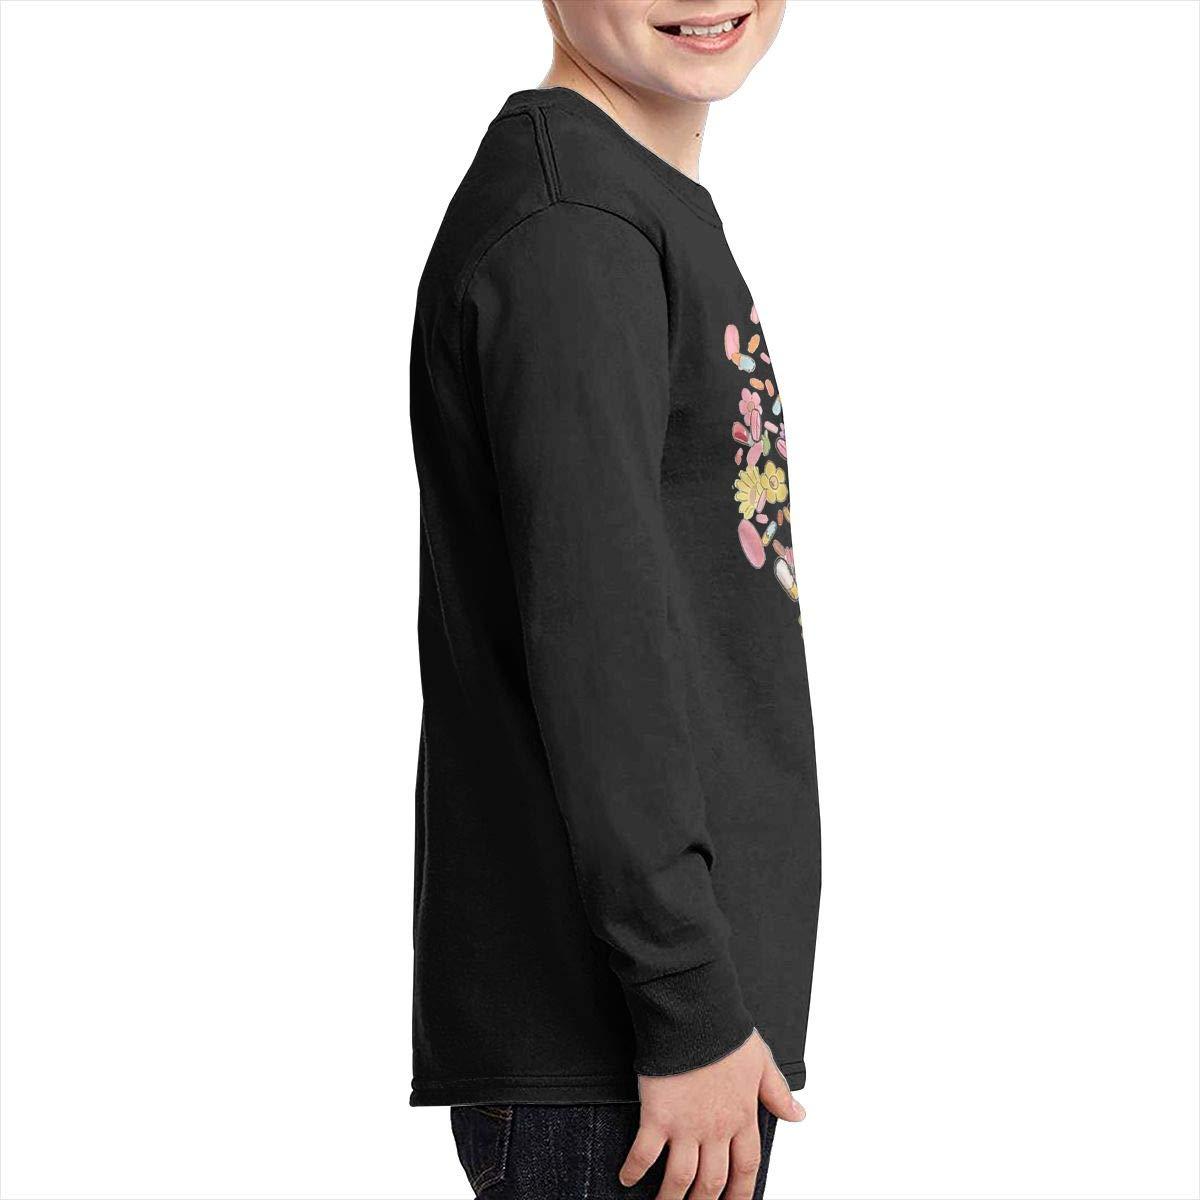 TWOSKILL Youth Juice-WRLD Long Sleeves Shirt Boys Girls